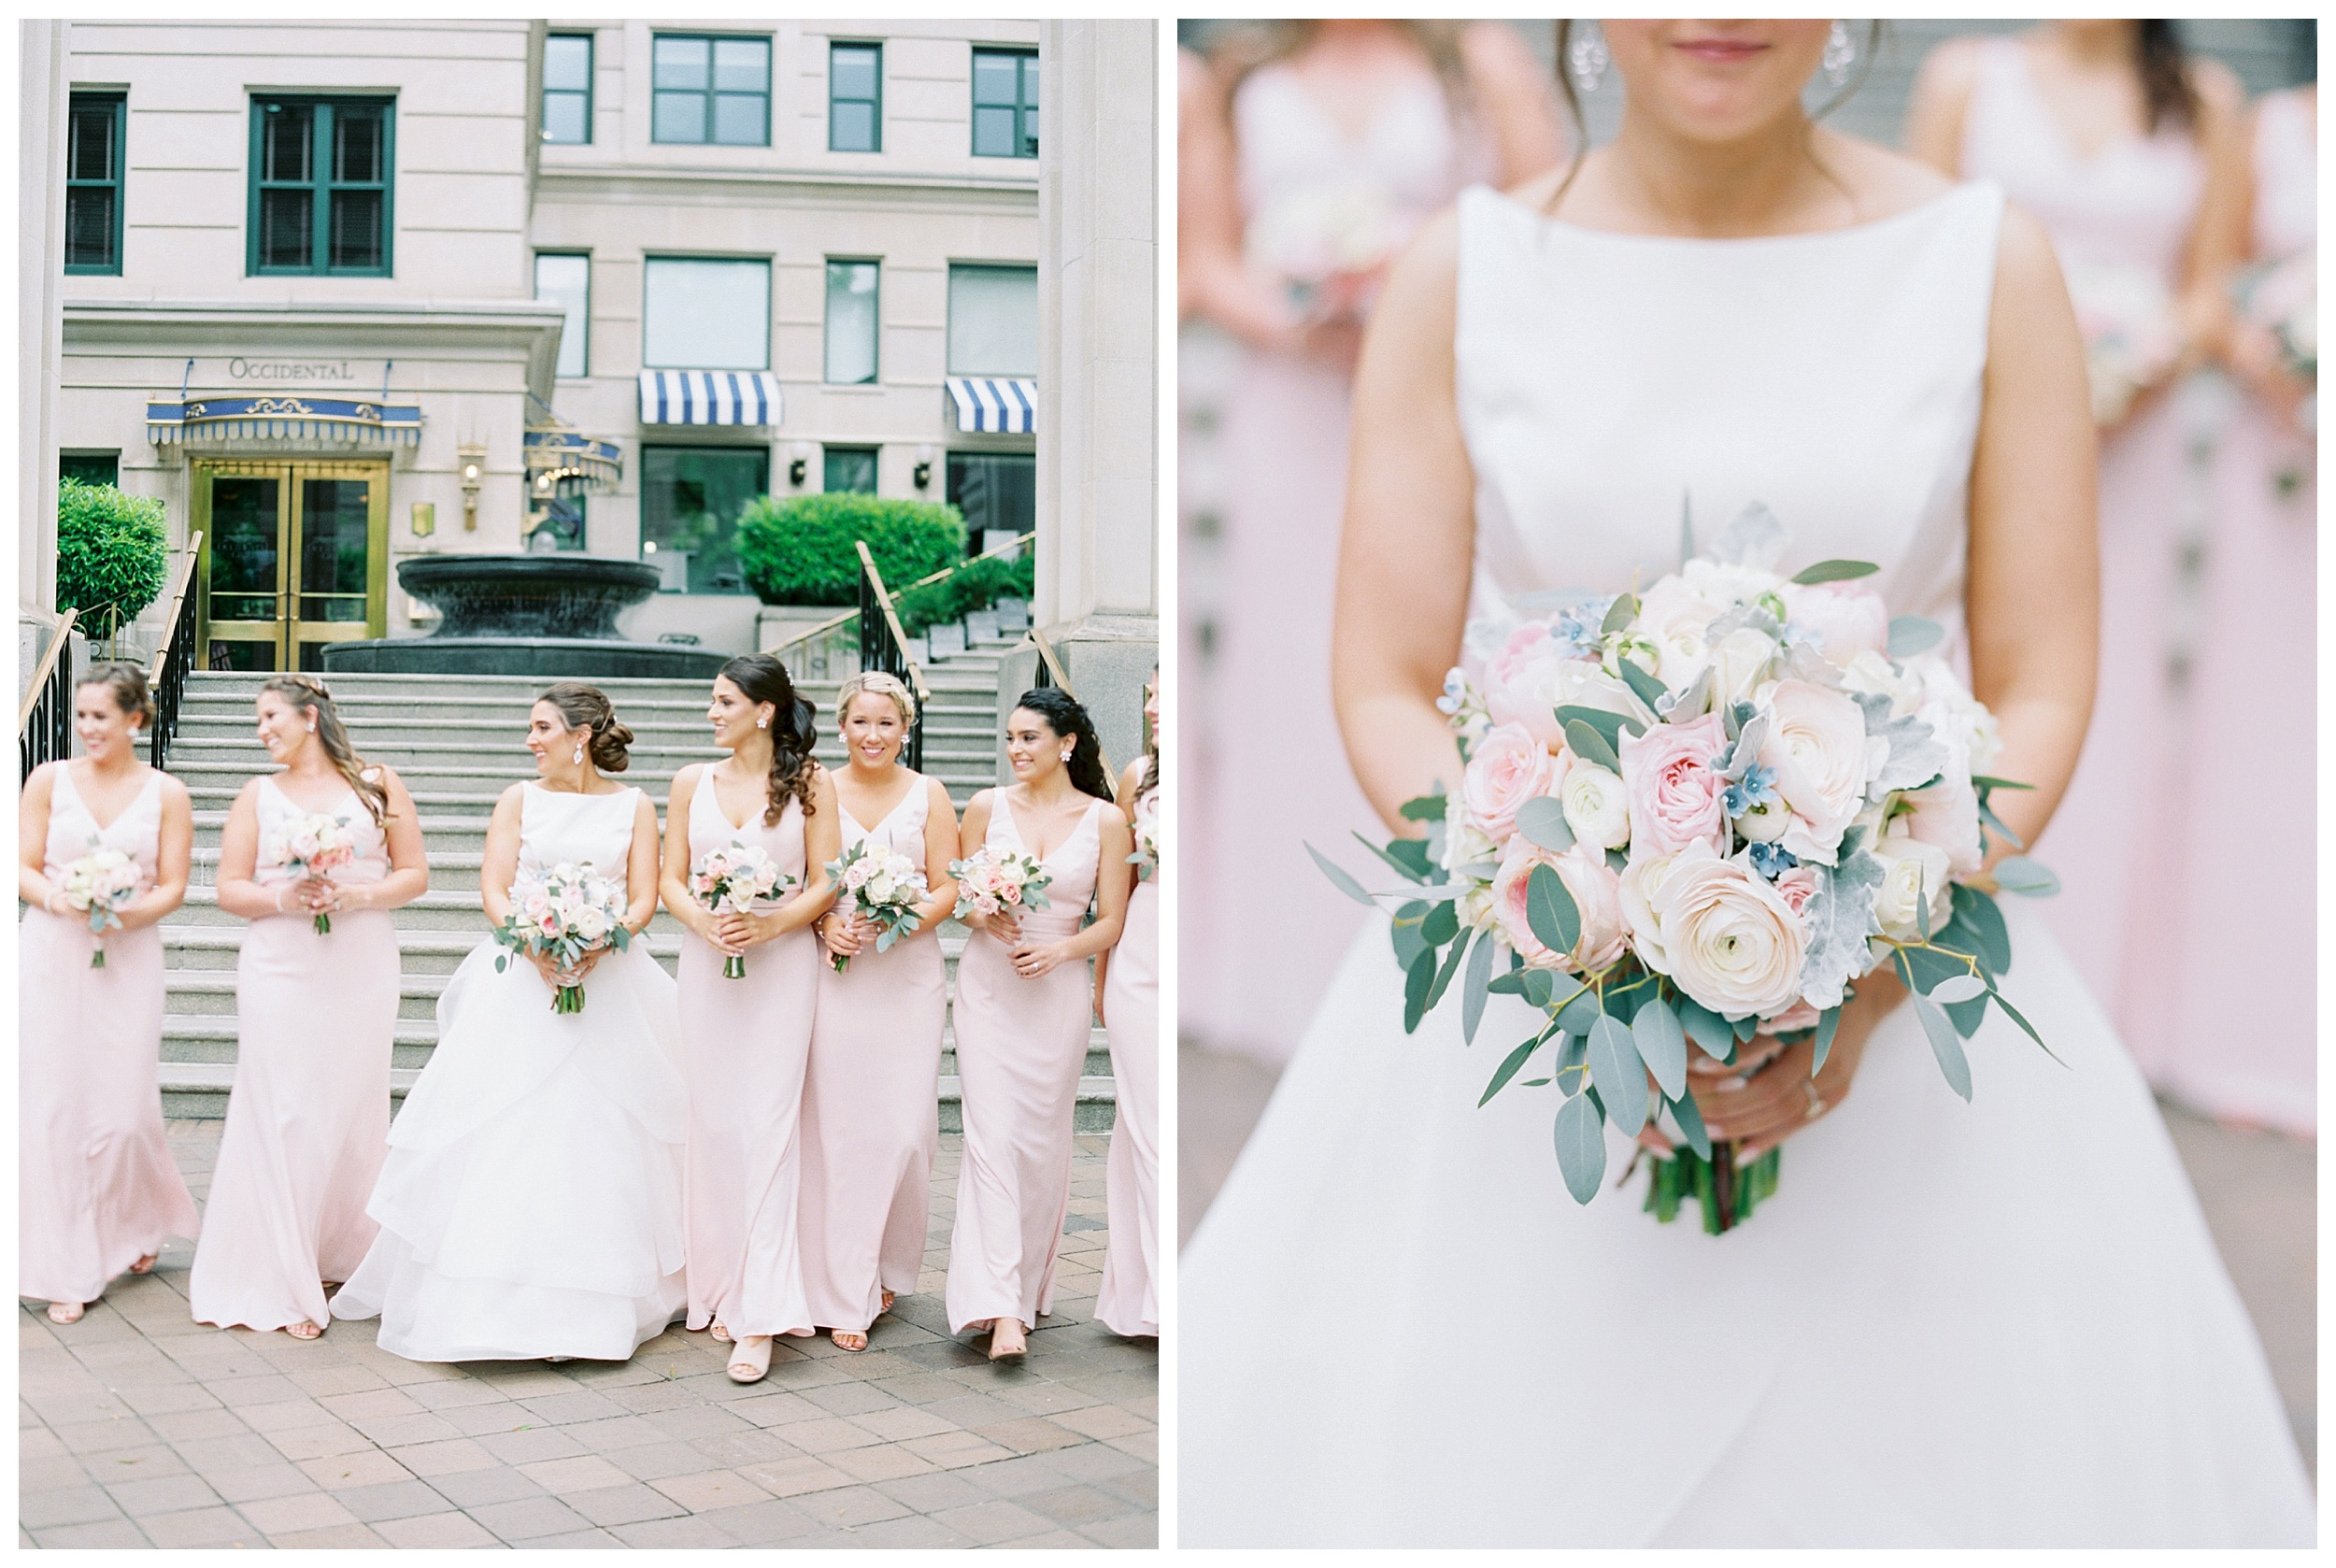 DAR Constitution Hall Wedding Wedding | Daughters of the American Revolution Wedding | District of Columbia Film Wedding Photographer Kir Tuben_0028.jpg